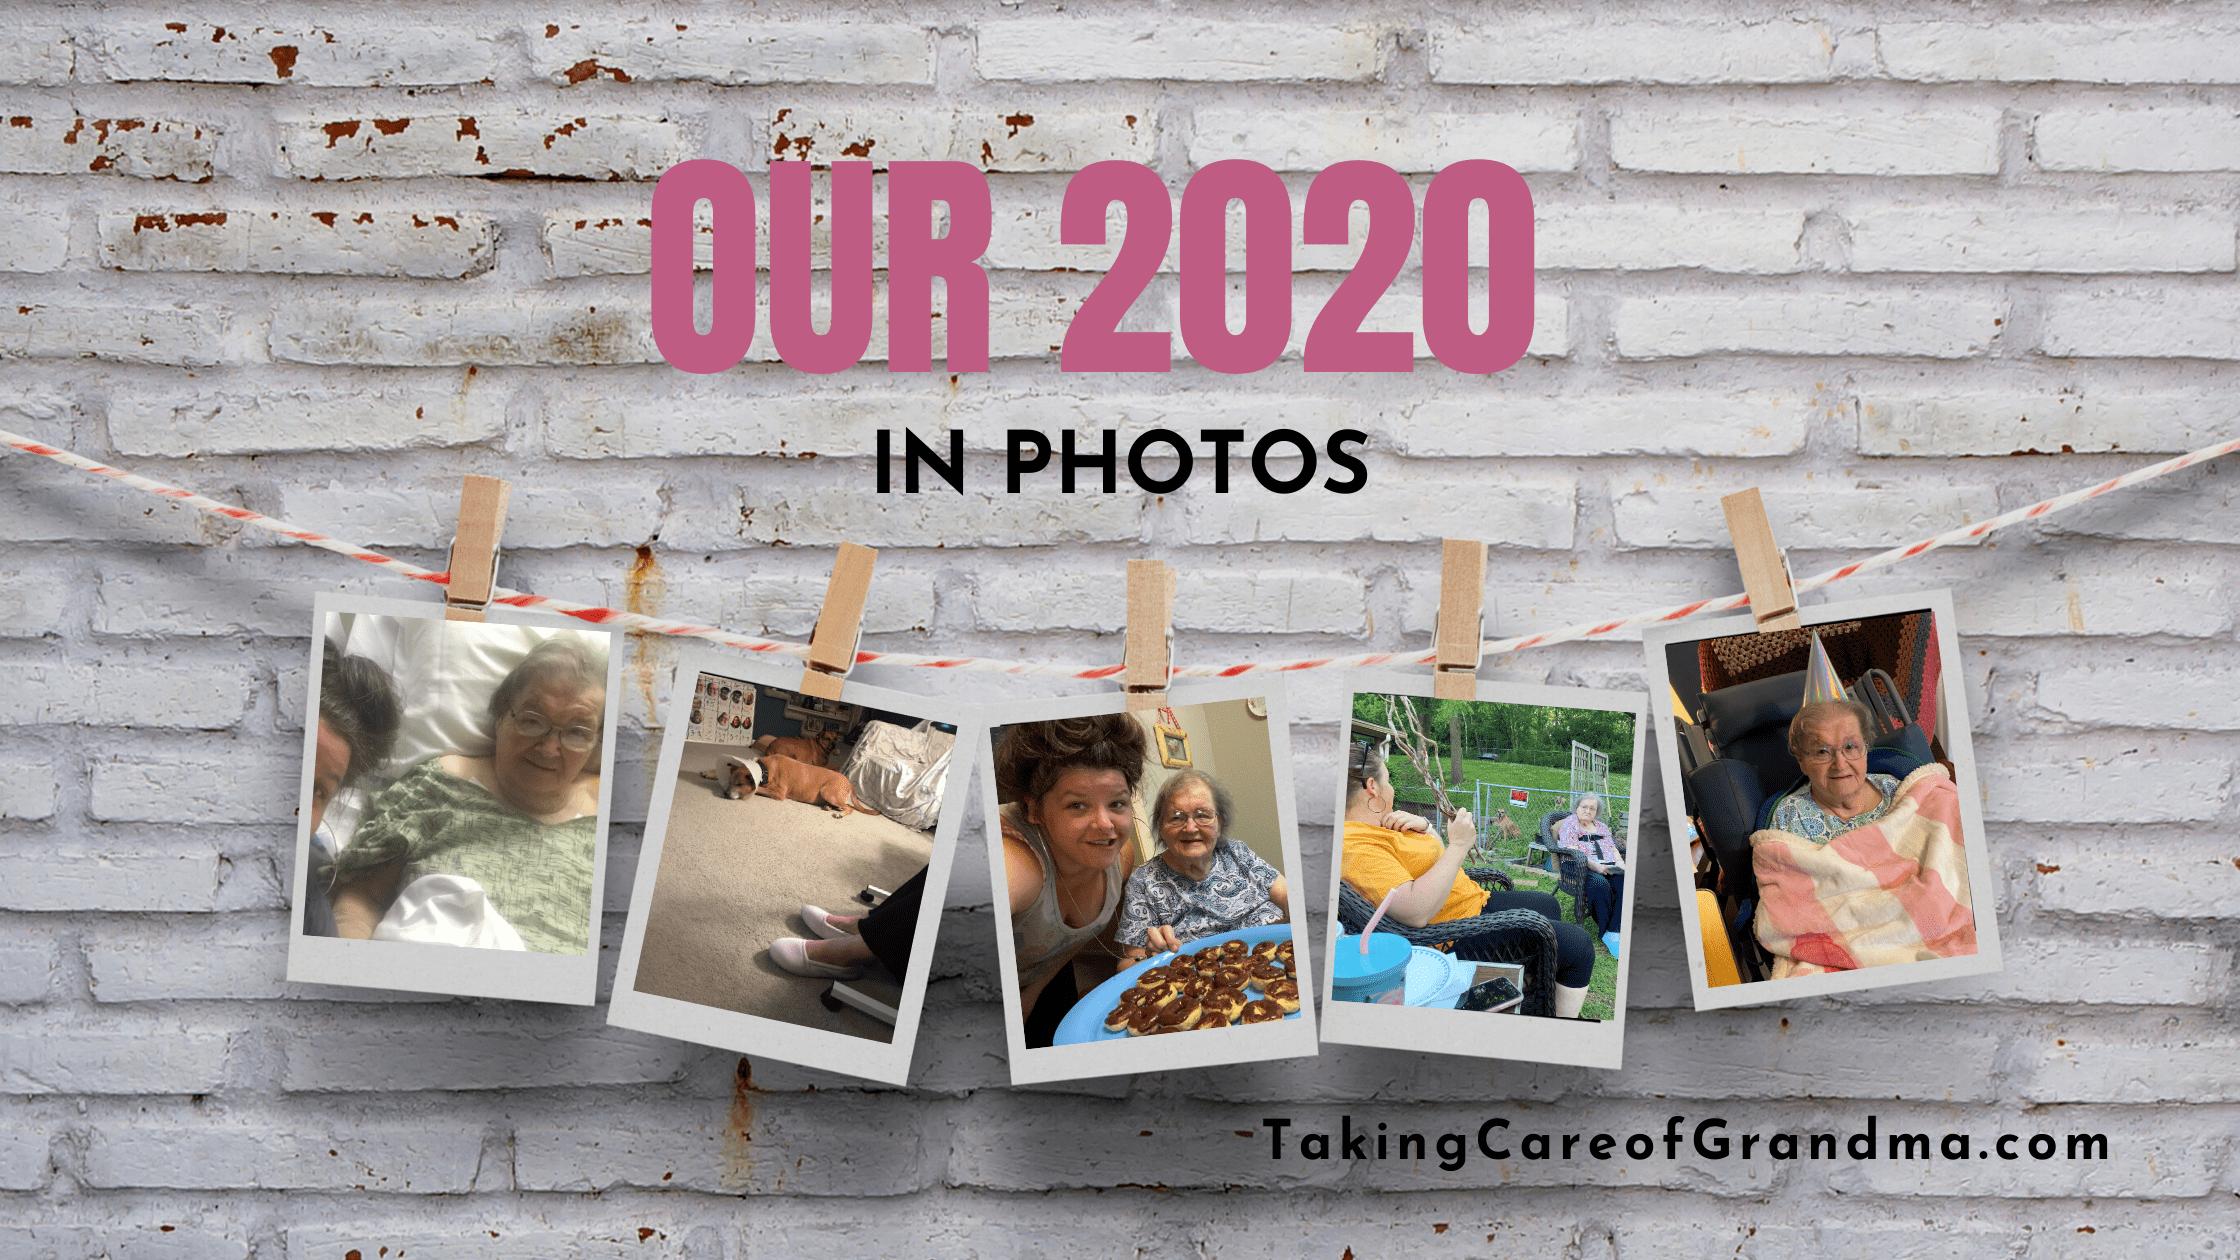 TakingCareofGrandma.com OUR 2020 IN PHOTOS